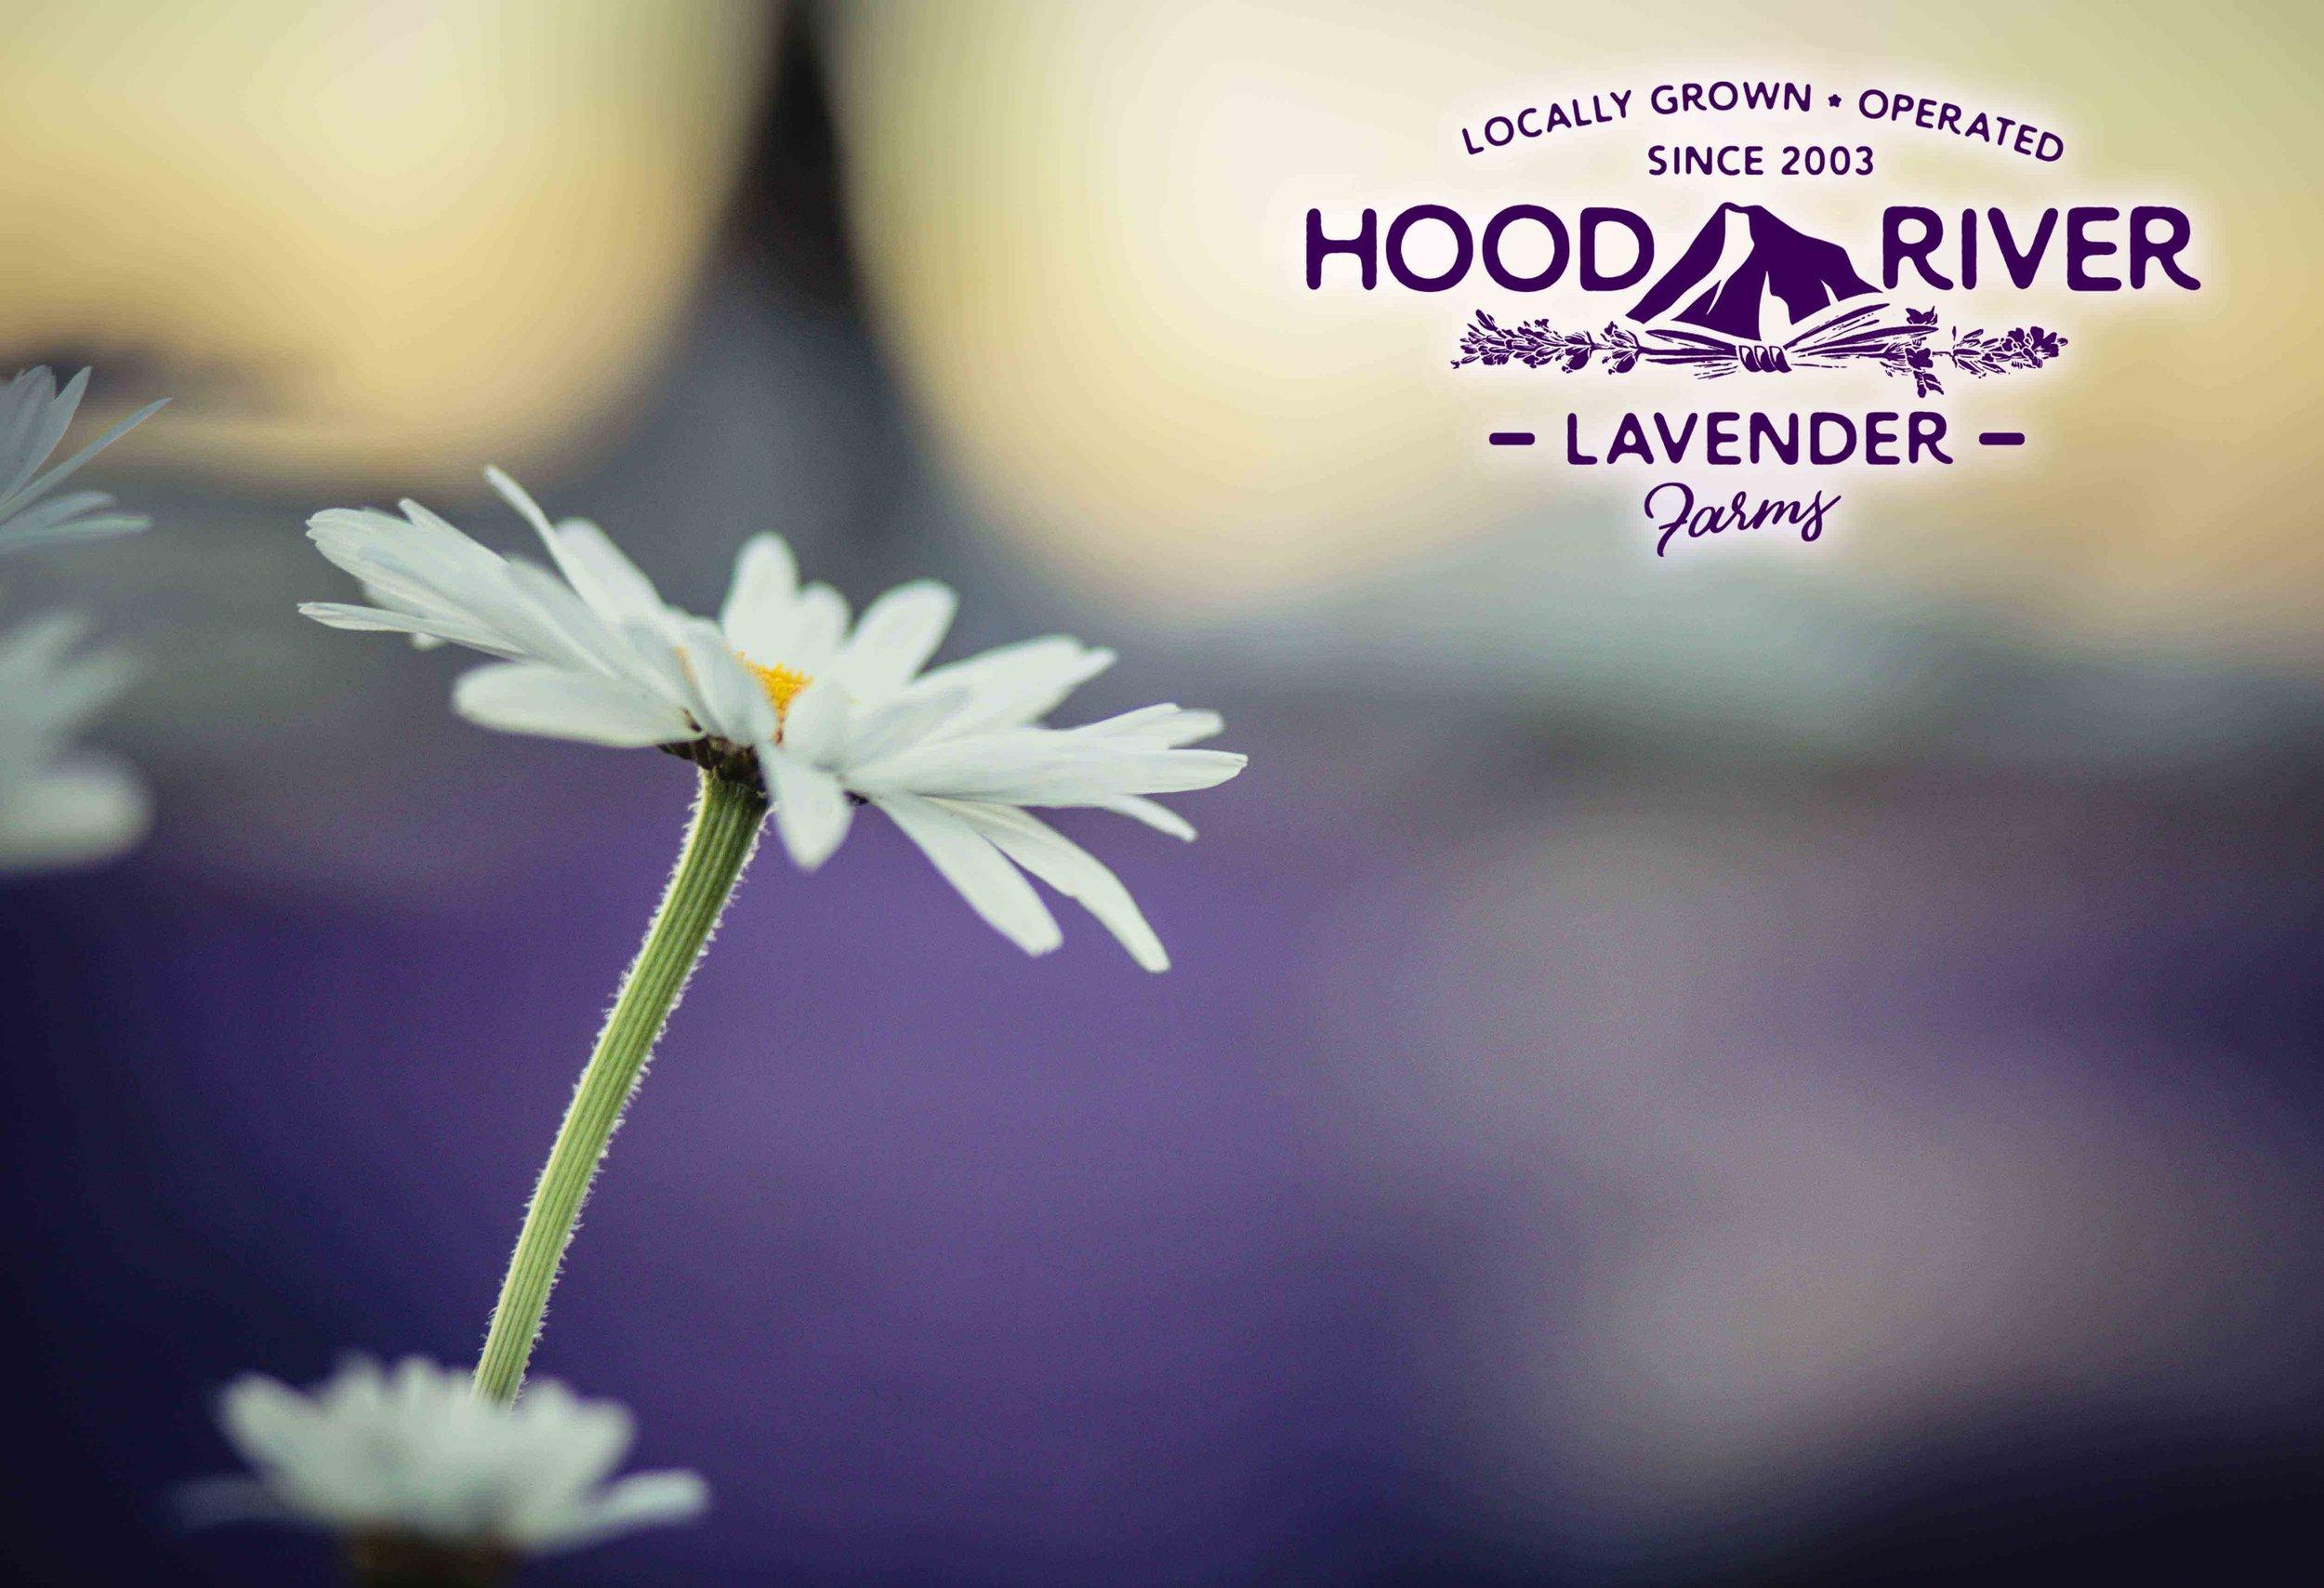 Hood River Lavender Farms 6Columbia Gorge buy lavender online hood river odell portland pacific northwest pnw creams lavender_-41.jpg